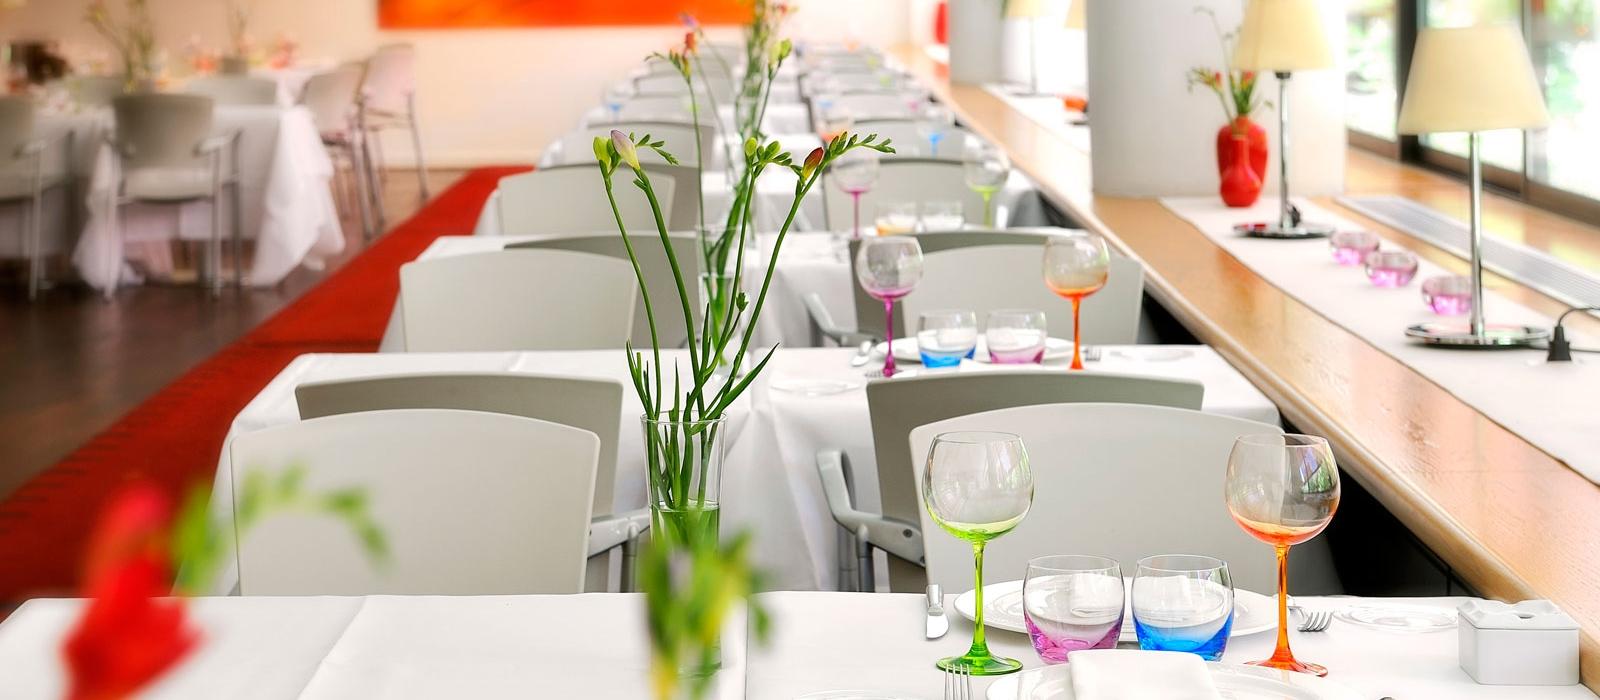 SoMa Restaurante - Vincci Soma